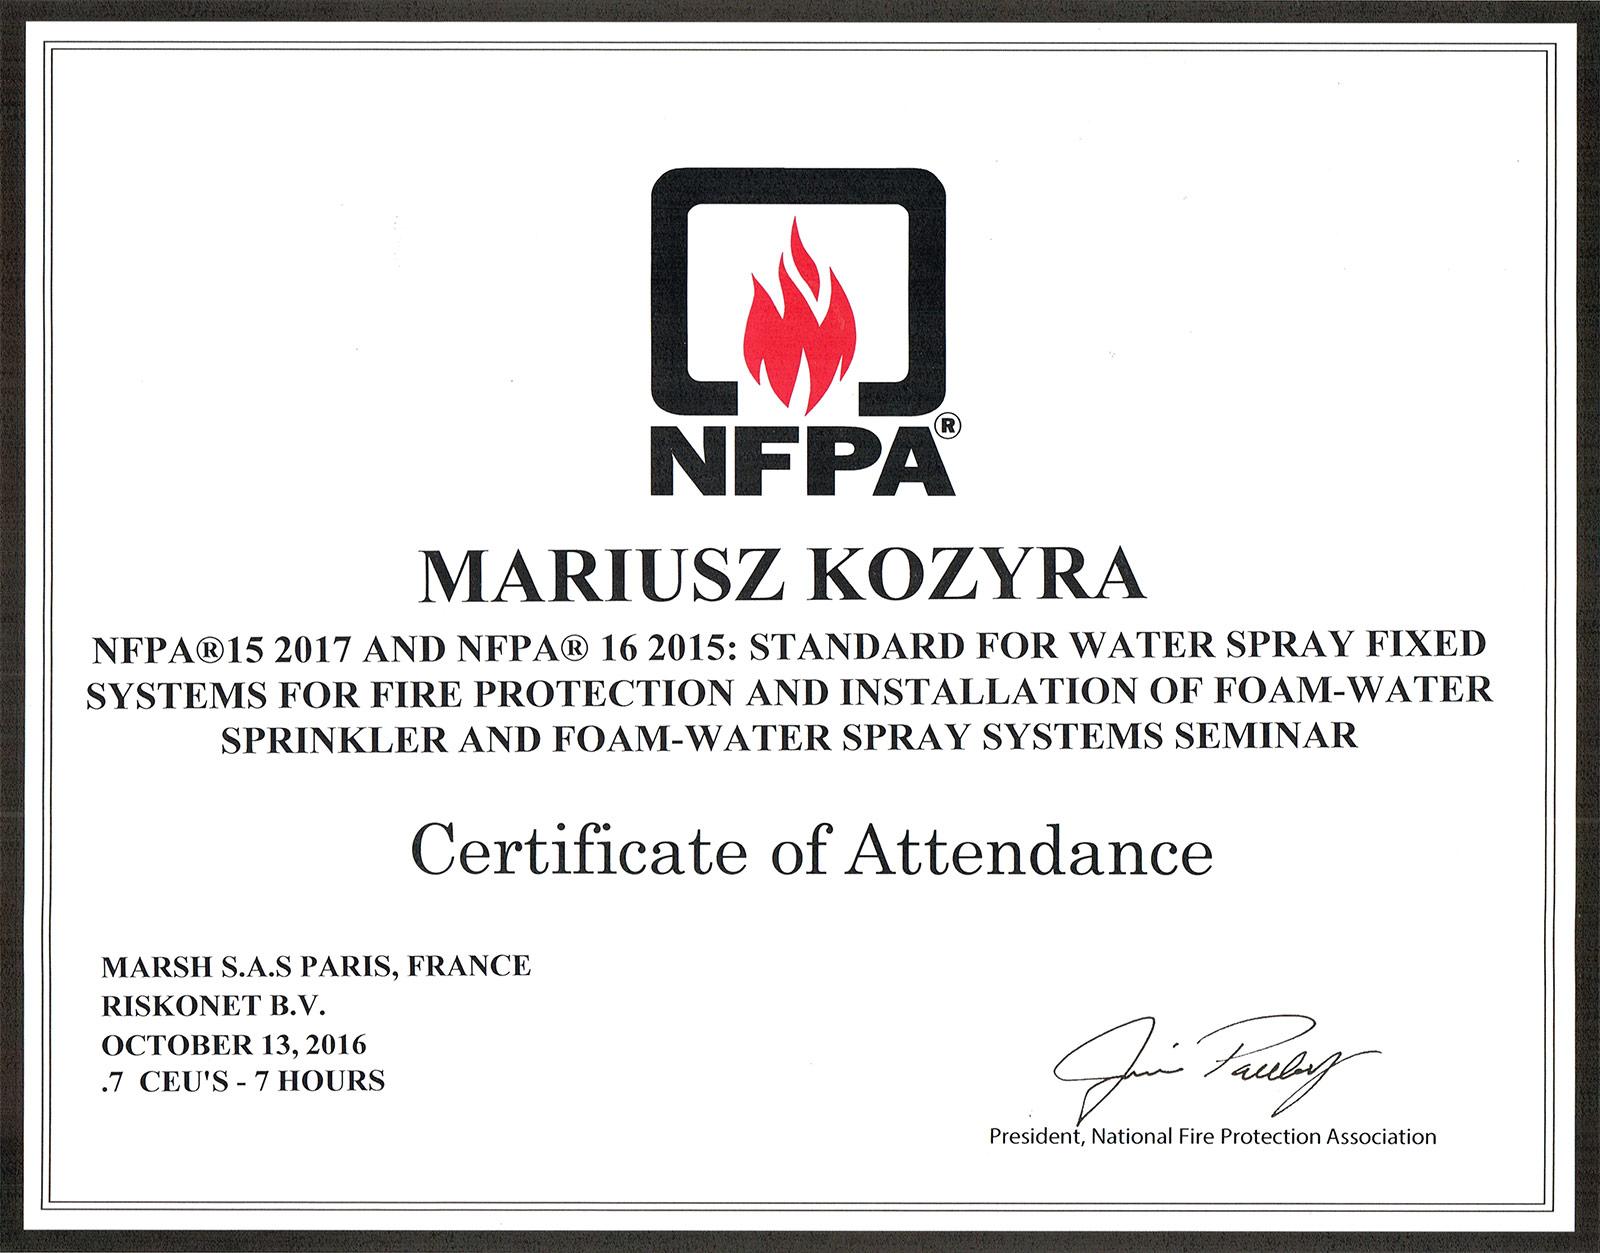 certyfikaty_nfpa15-2017_nfpa16_2015_mariusz-kozyra